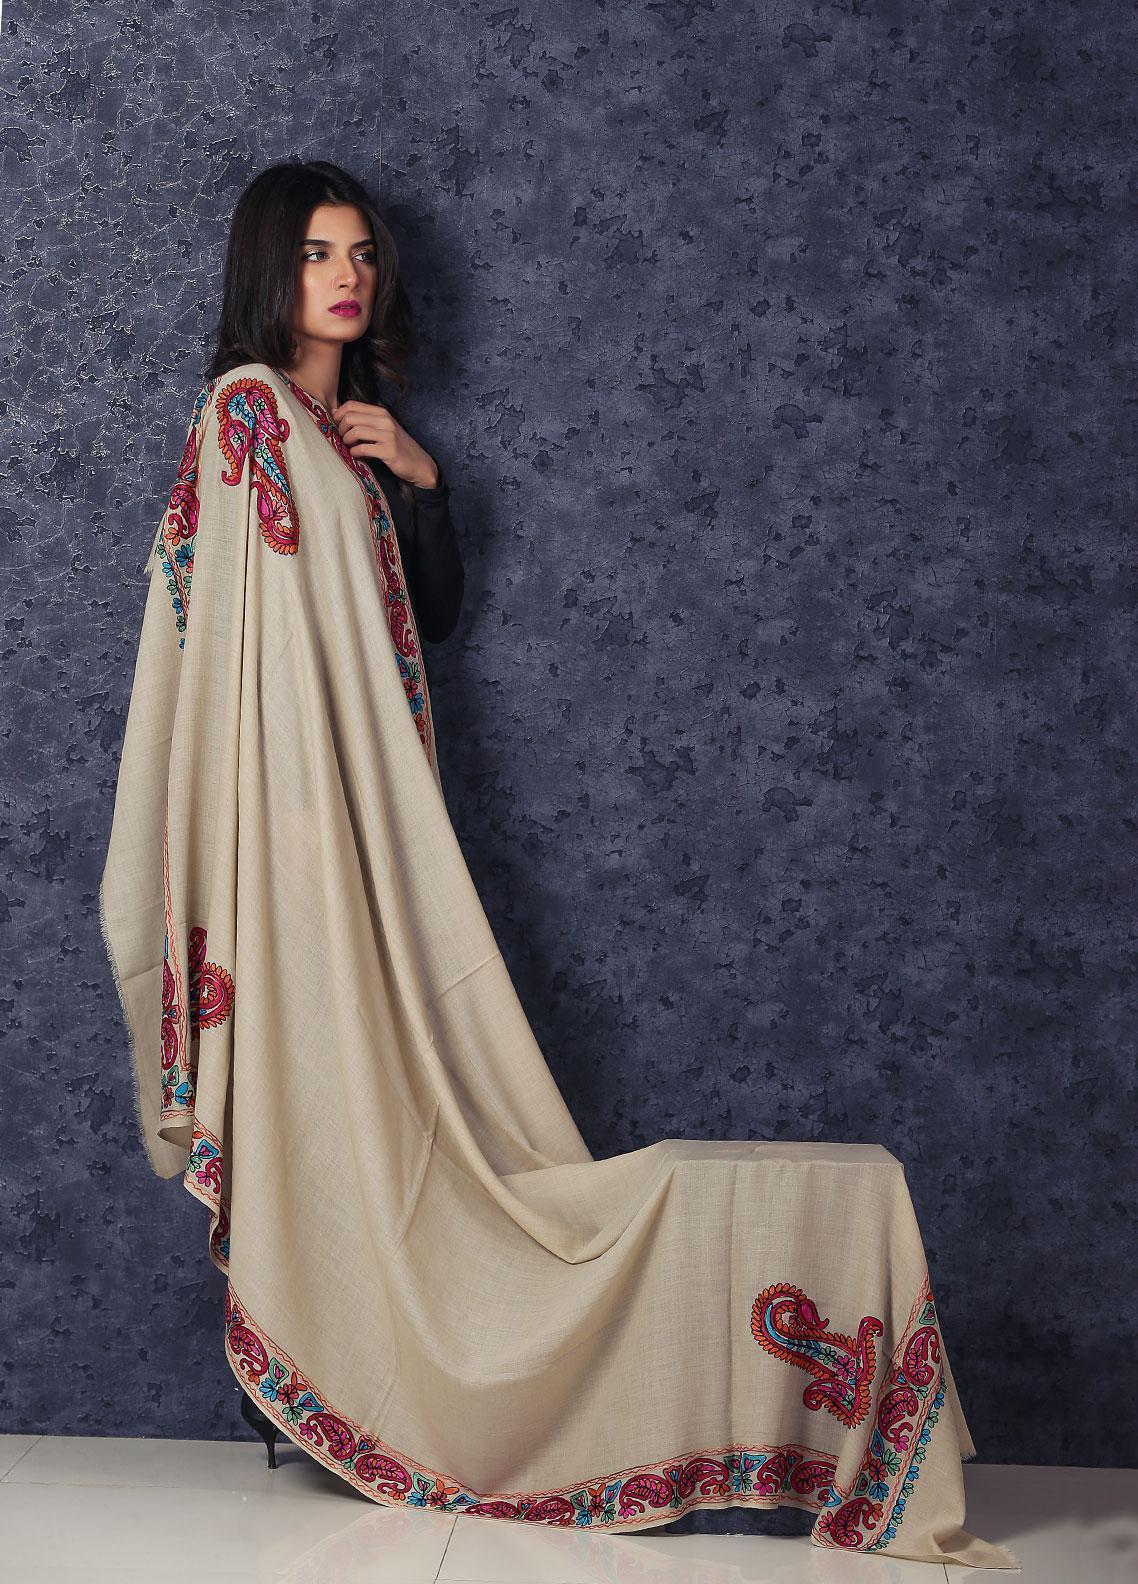 Sanaulla Exclusive Range Embroidered Pashmina  Shawl MIR-282 Beige - Kashmiri Shawls